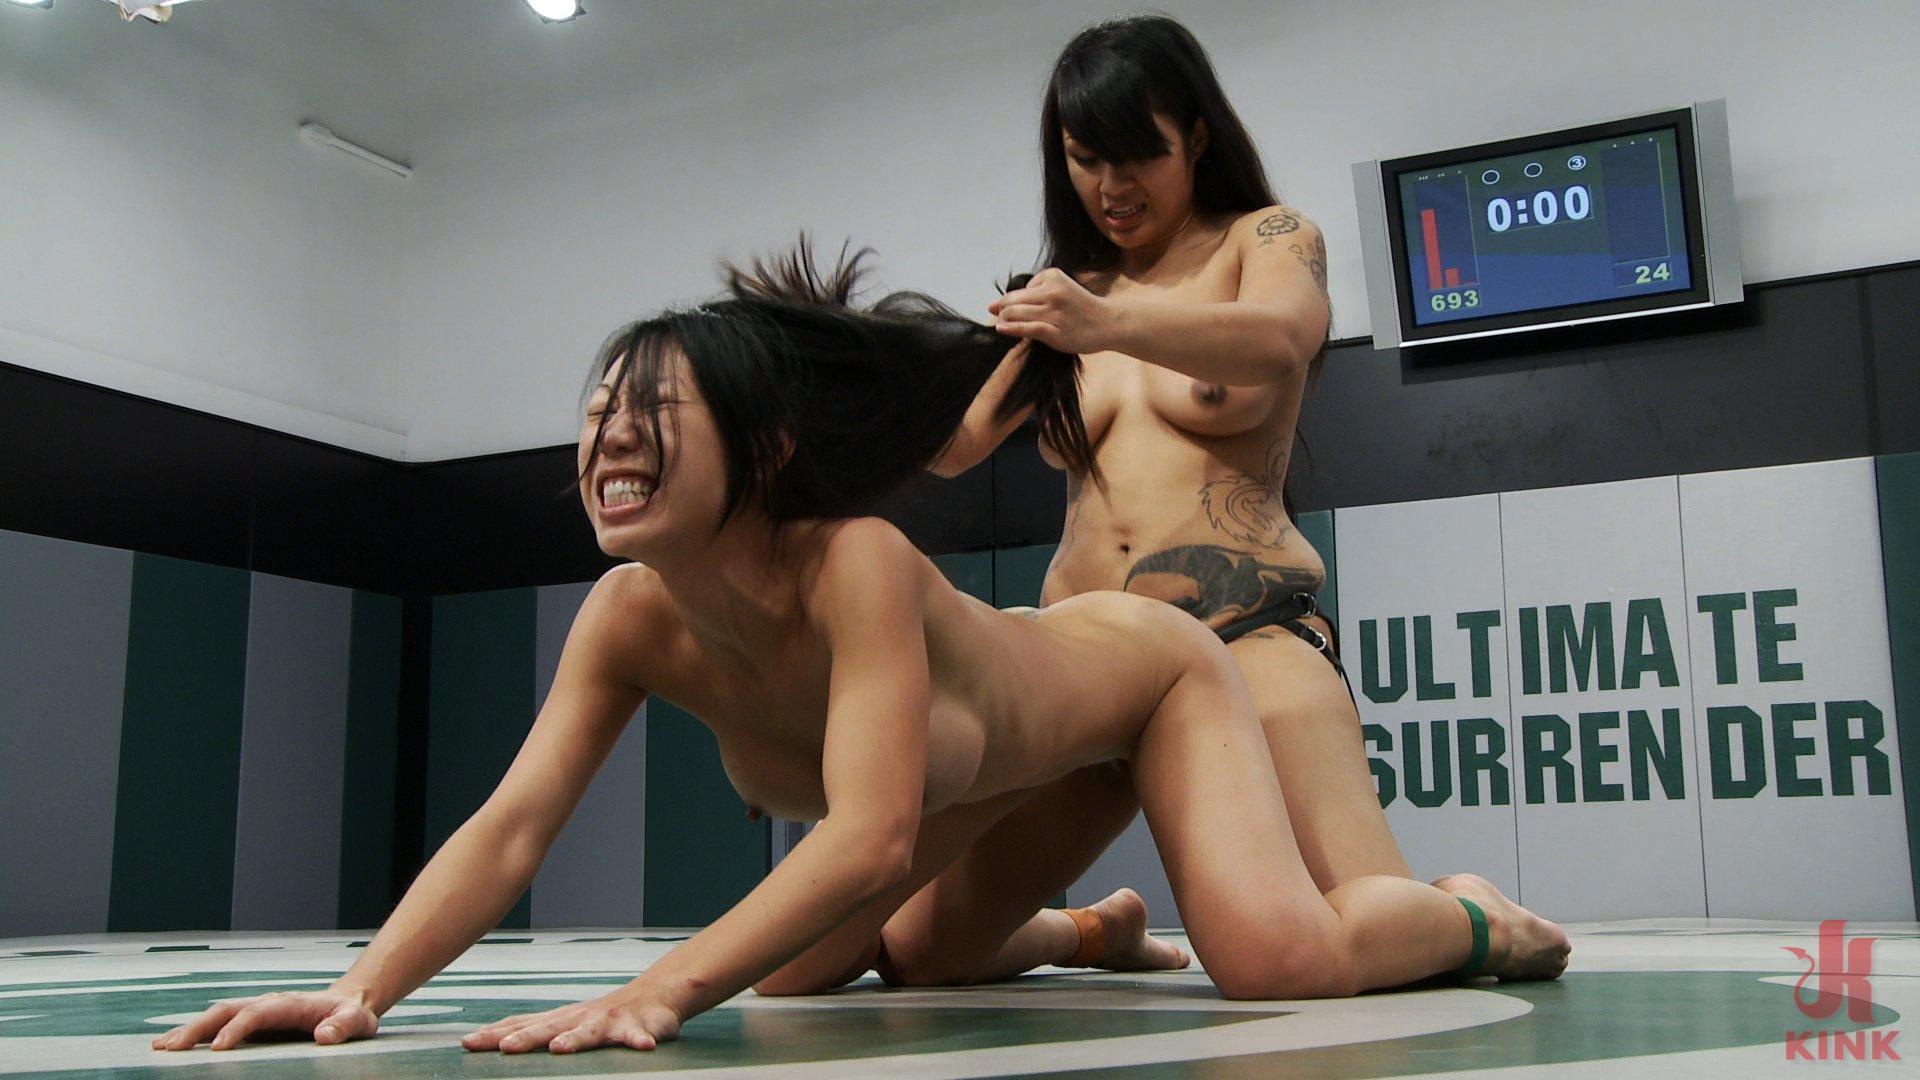 Ultimate surrender asian